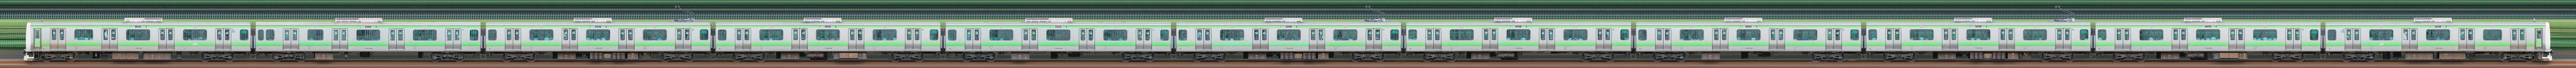 JR東日本 山手線 E231系トウ501編成の編成サイドビュー